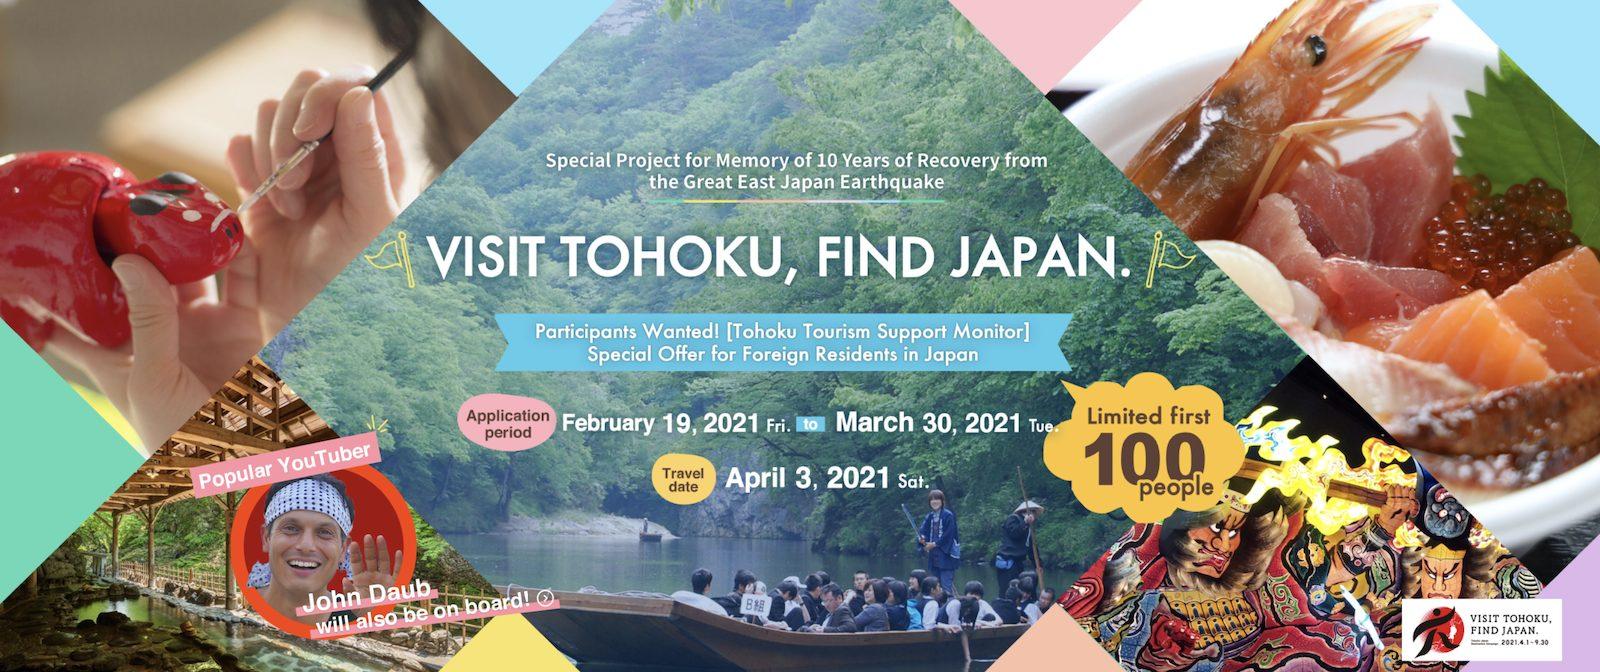 VISIT TOHOKU, FIND JAPAN